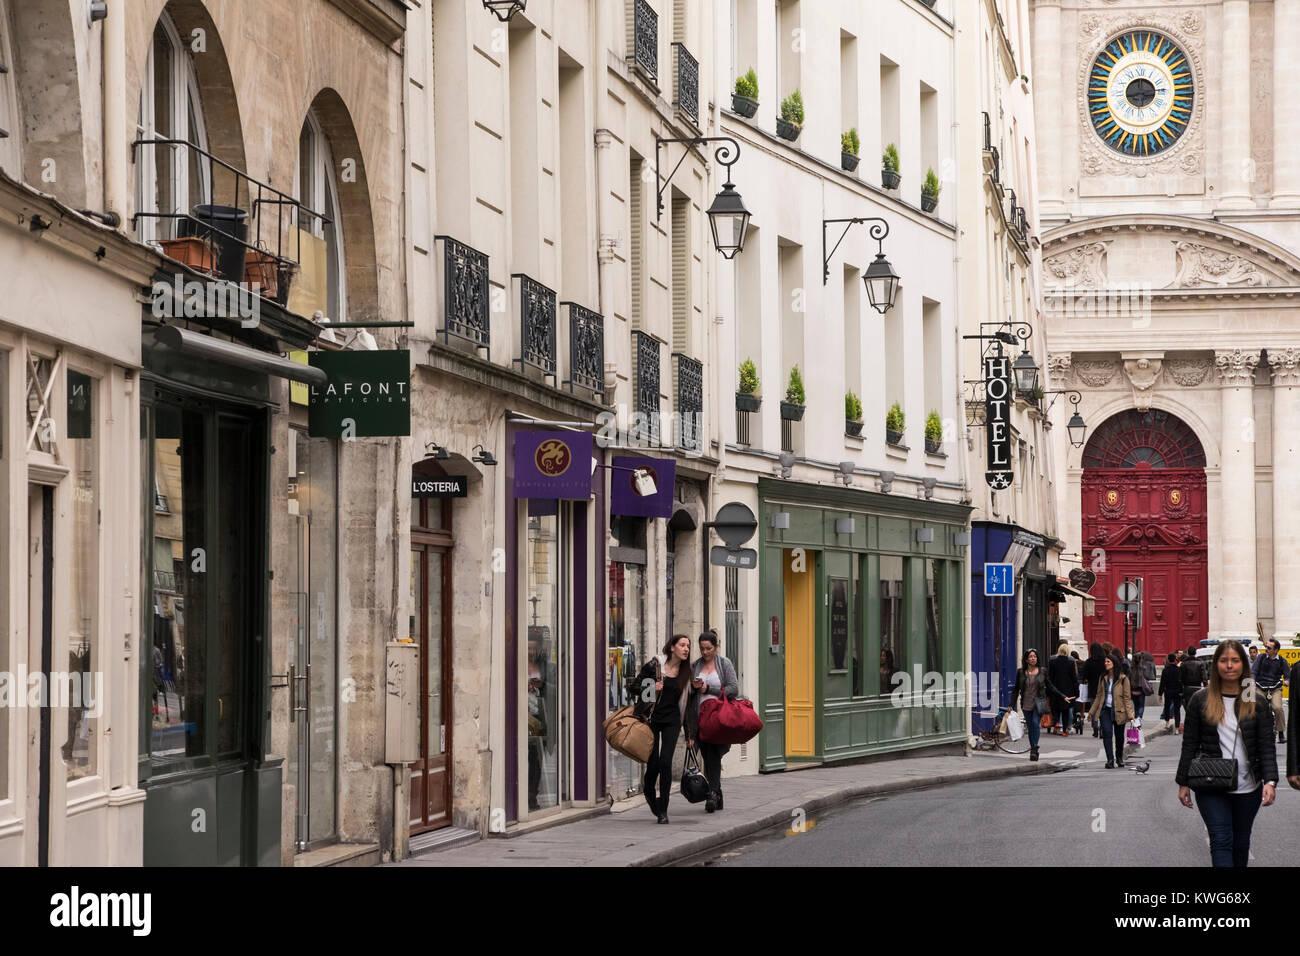 4th arrondissement stock photos 4th arrondissement stock images alamy. Black Bedroom Furniture Sets. Home Design Ideas